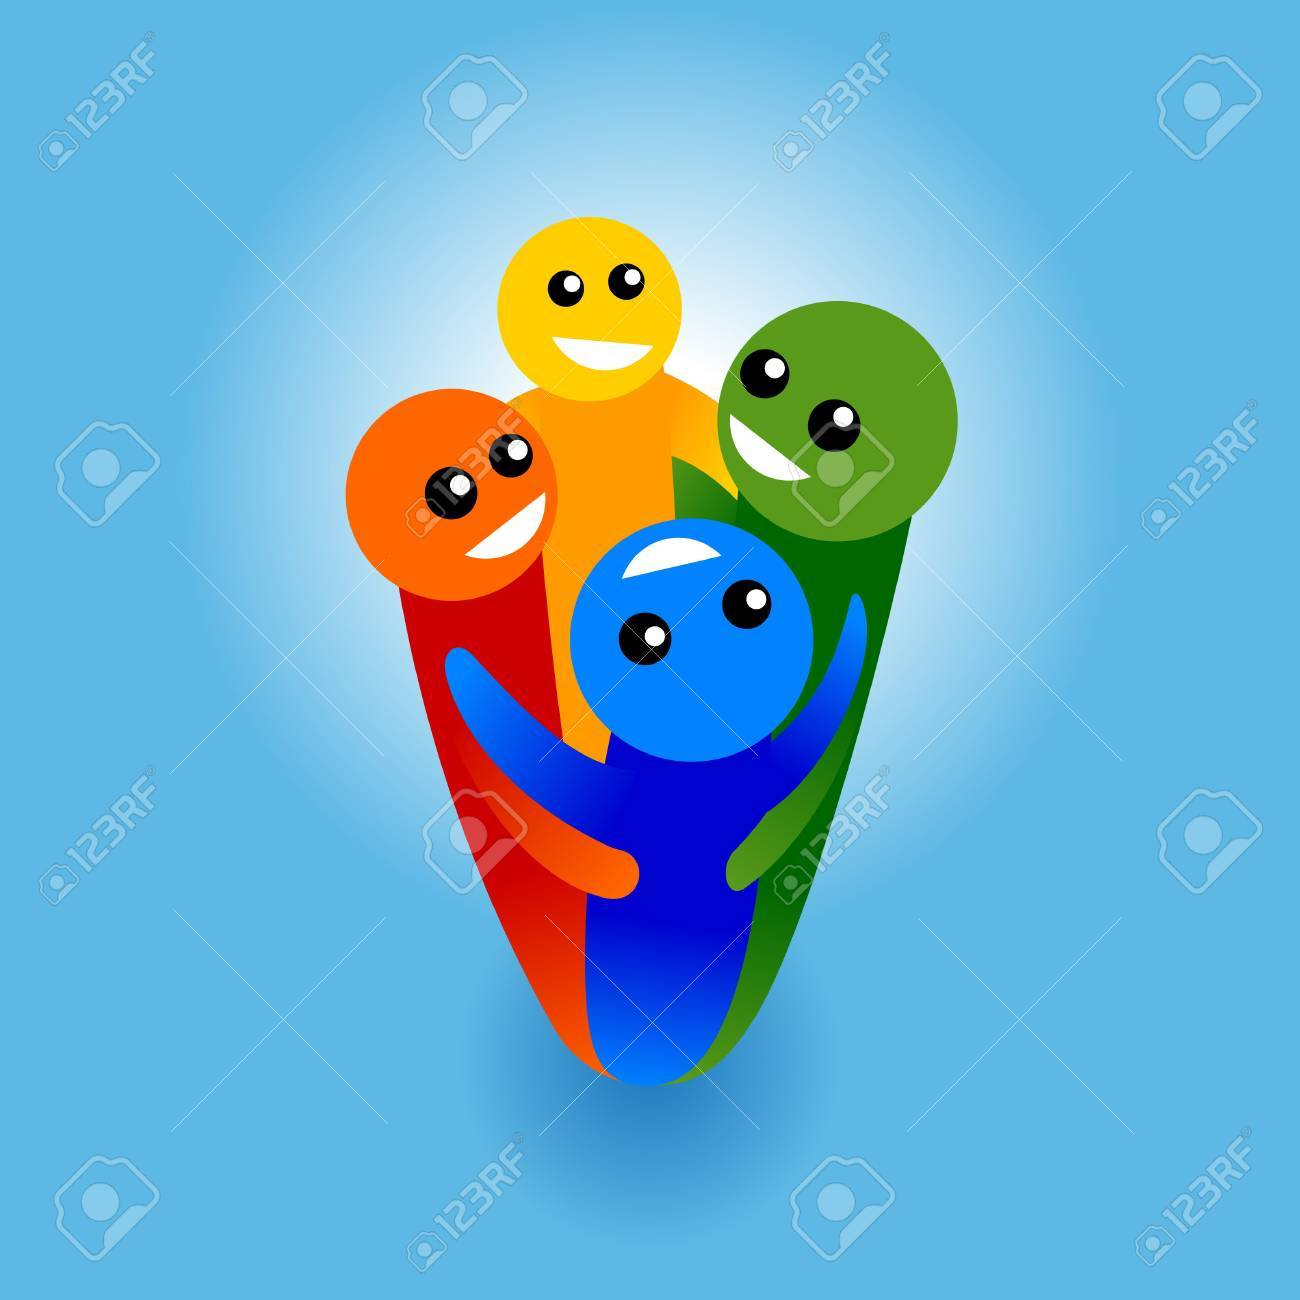 colorful community design element Stock Vector - 10121829